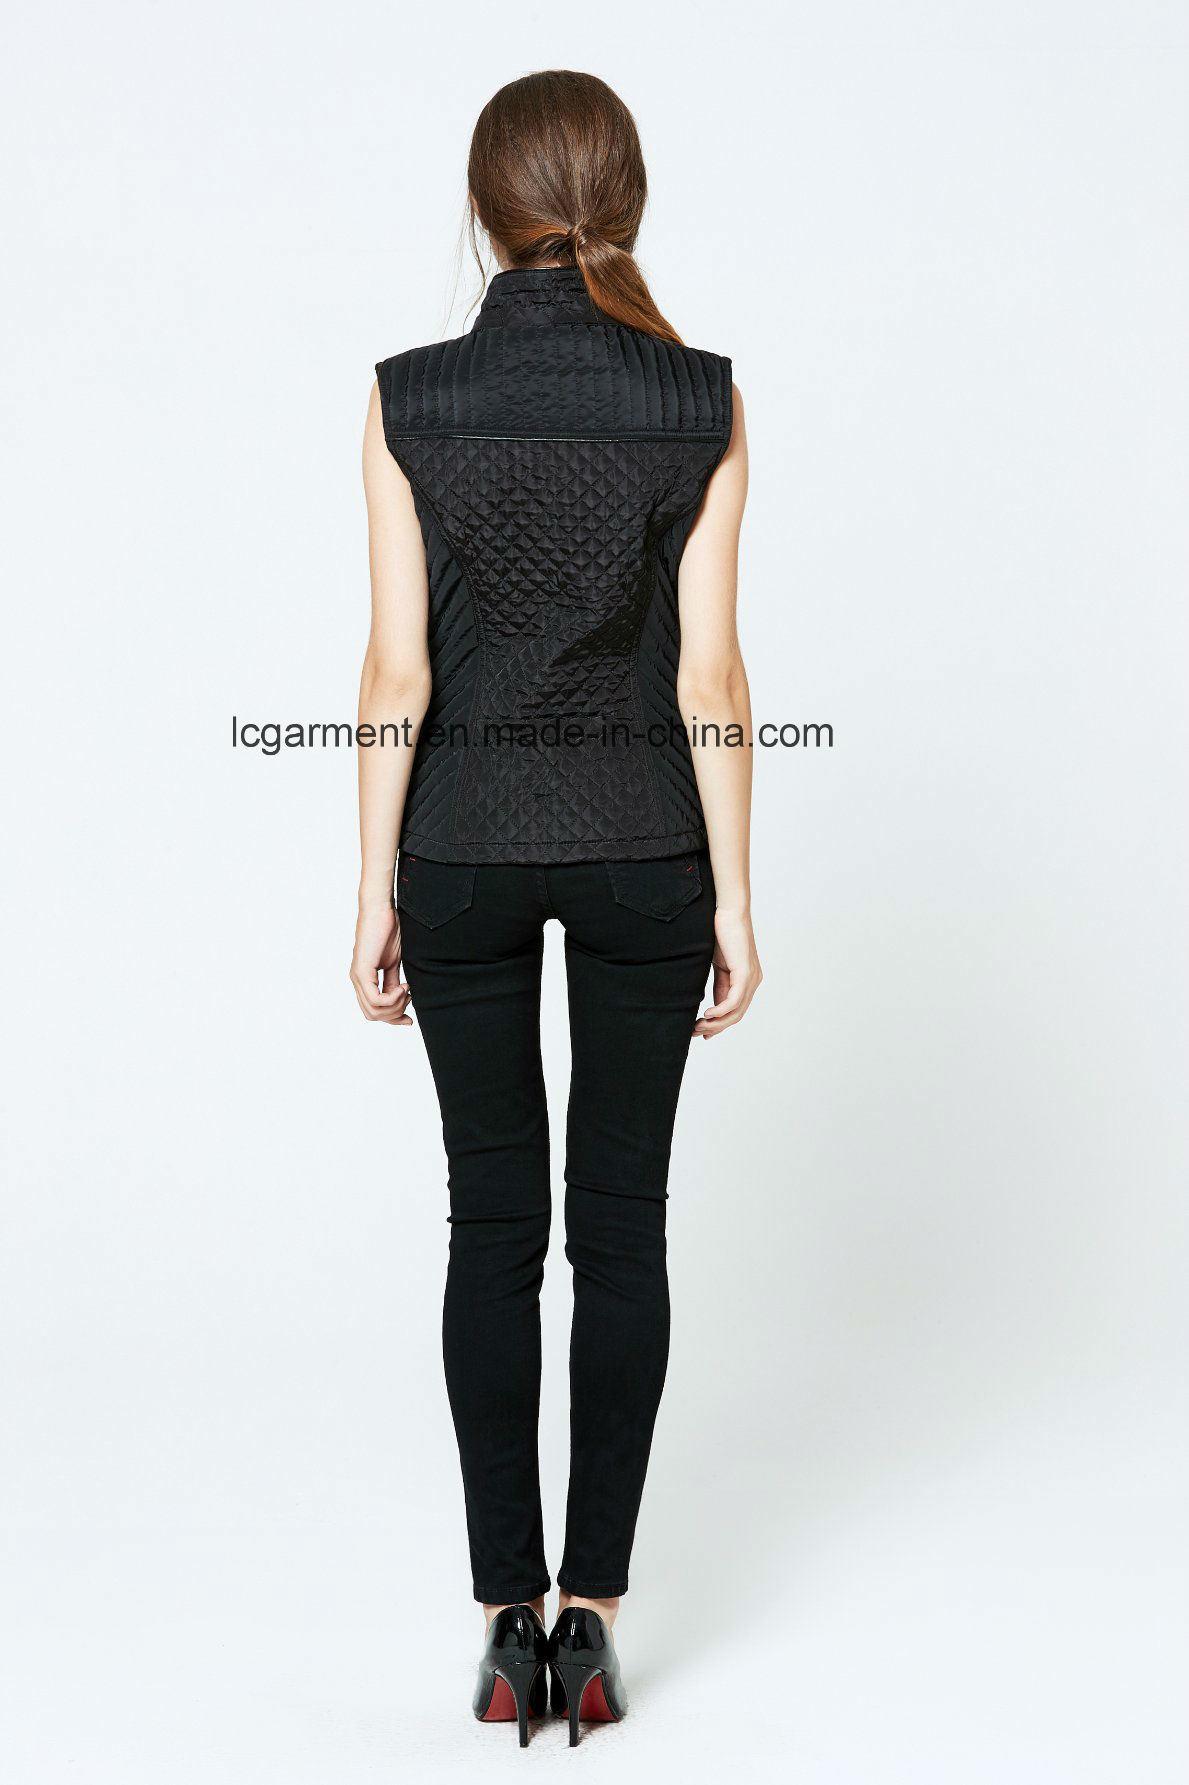 Fashionable Style Winter Slim Fit Leather Vest Zipper Black Waistcoat